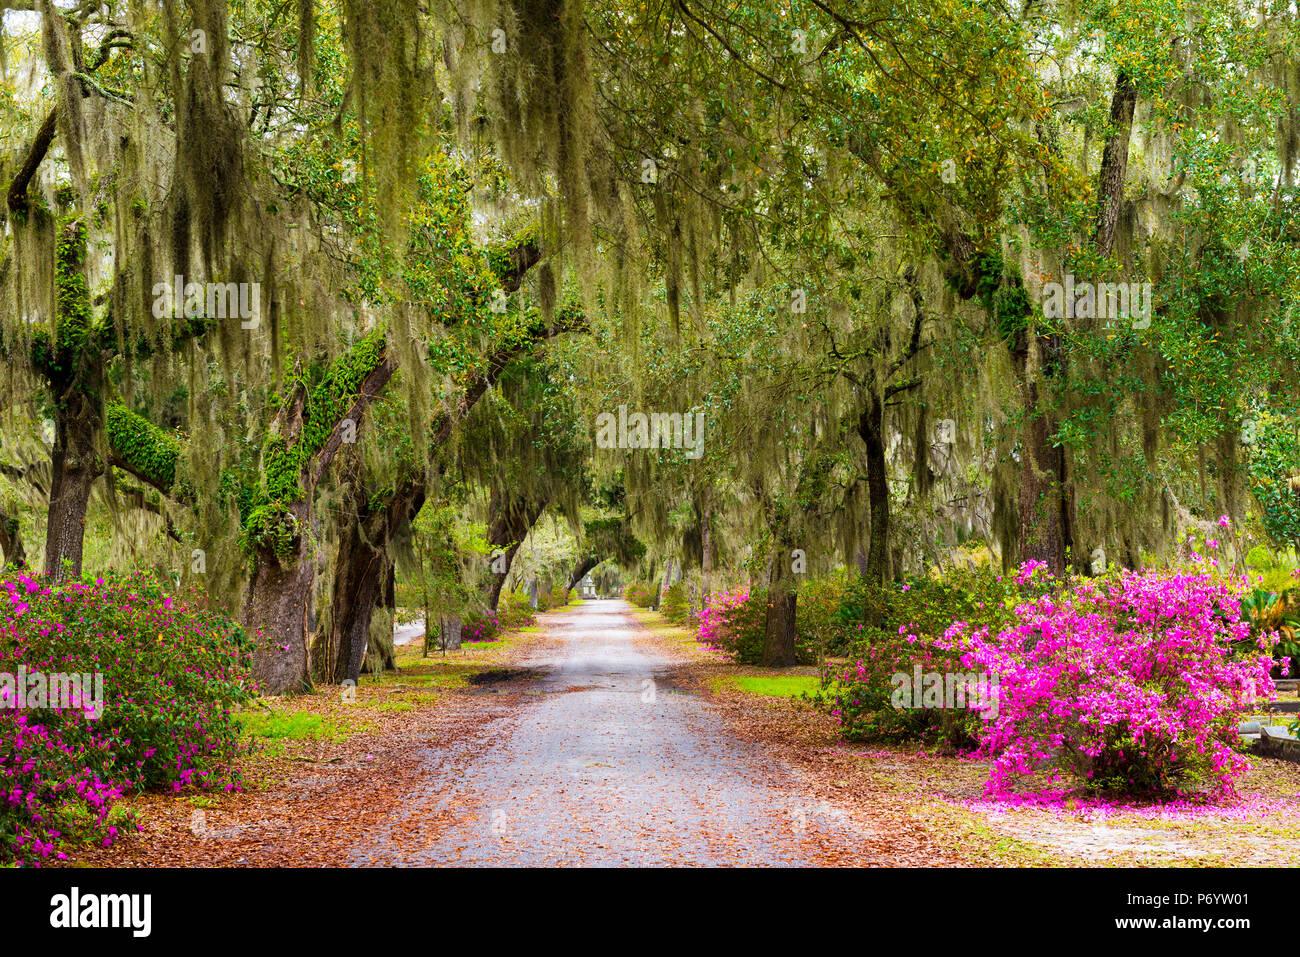 USA, Georgia, Savanah, Tree lined bath way in the Bonaventure Cemetery Stock Photo